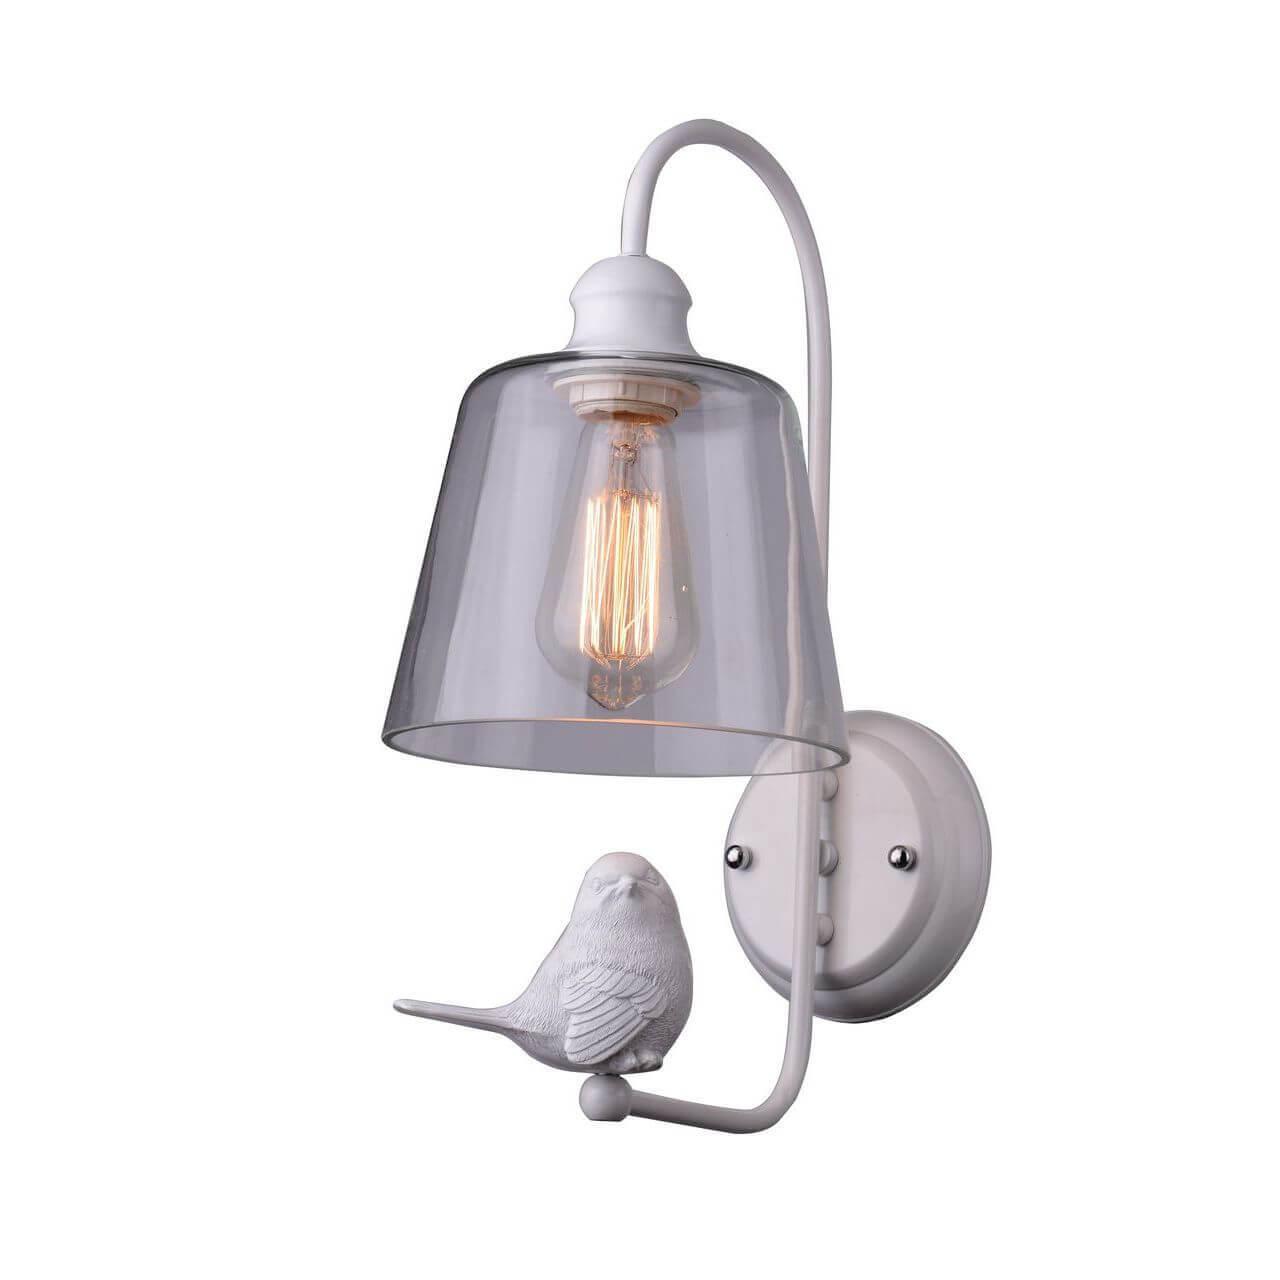 Бра Arte Lamp A4289AP-1WH Passero бра arte lamp prima a9140ap 1wh